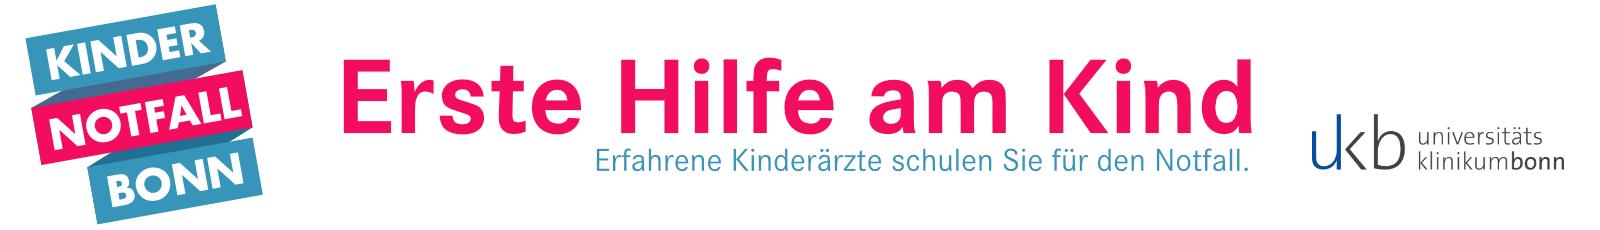 Kindernotfall Bonn - Erste Hilfe am Kind